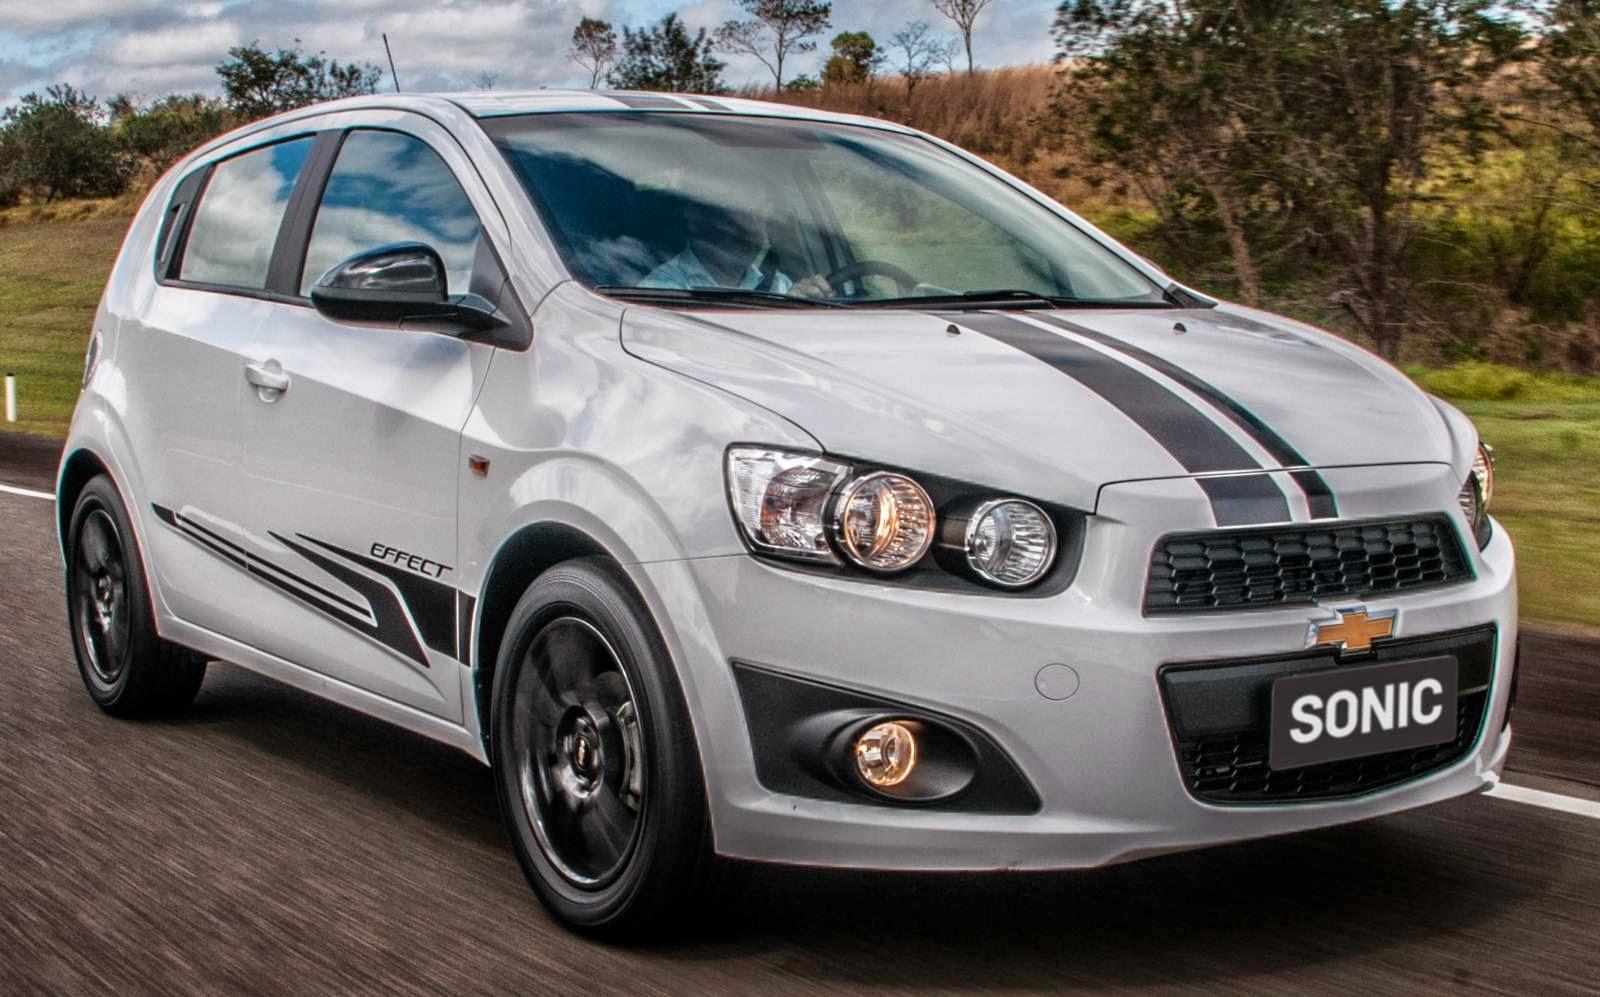 Chevrolet Sonic Effect 2014